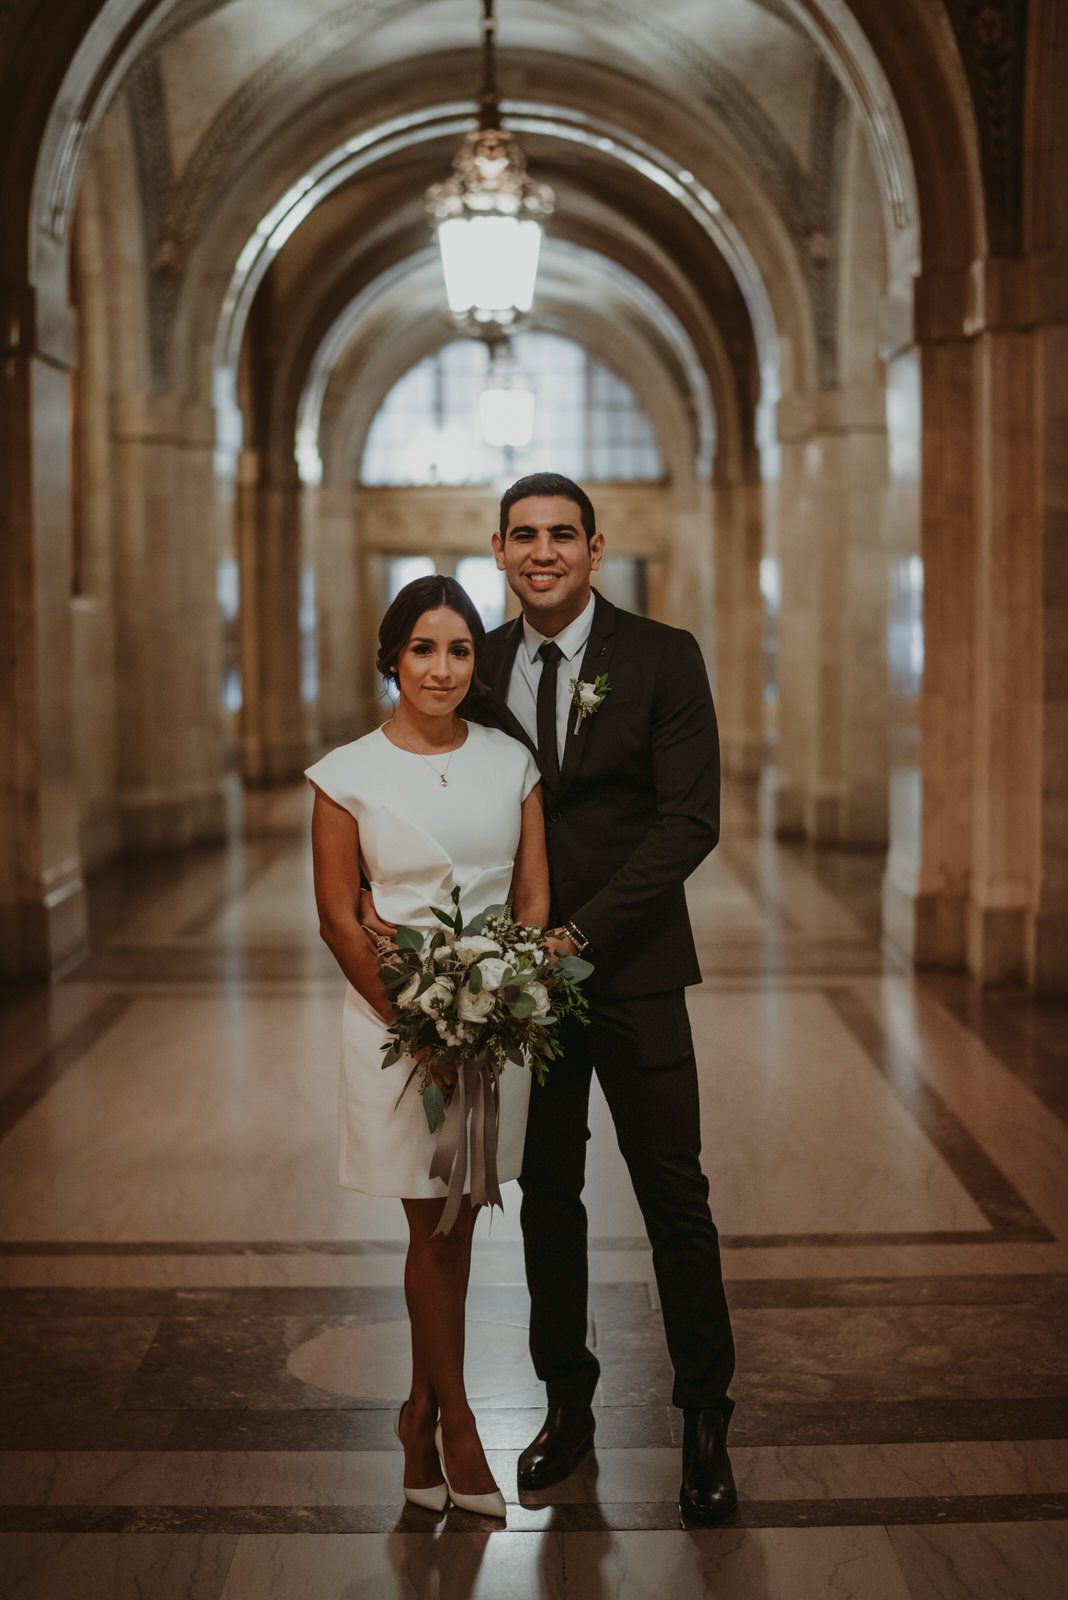 Chicago city hall wedding, elopement, wedding photographer - the Adamkovi